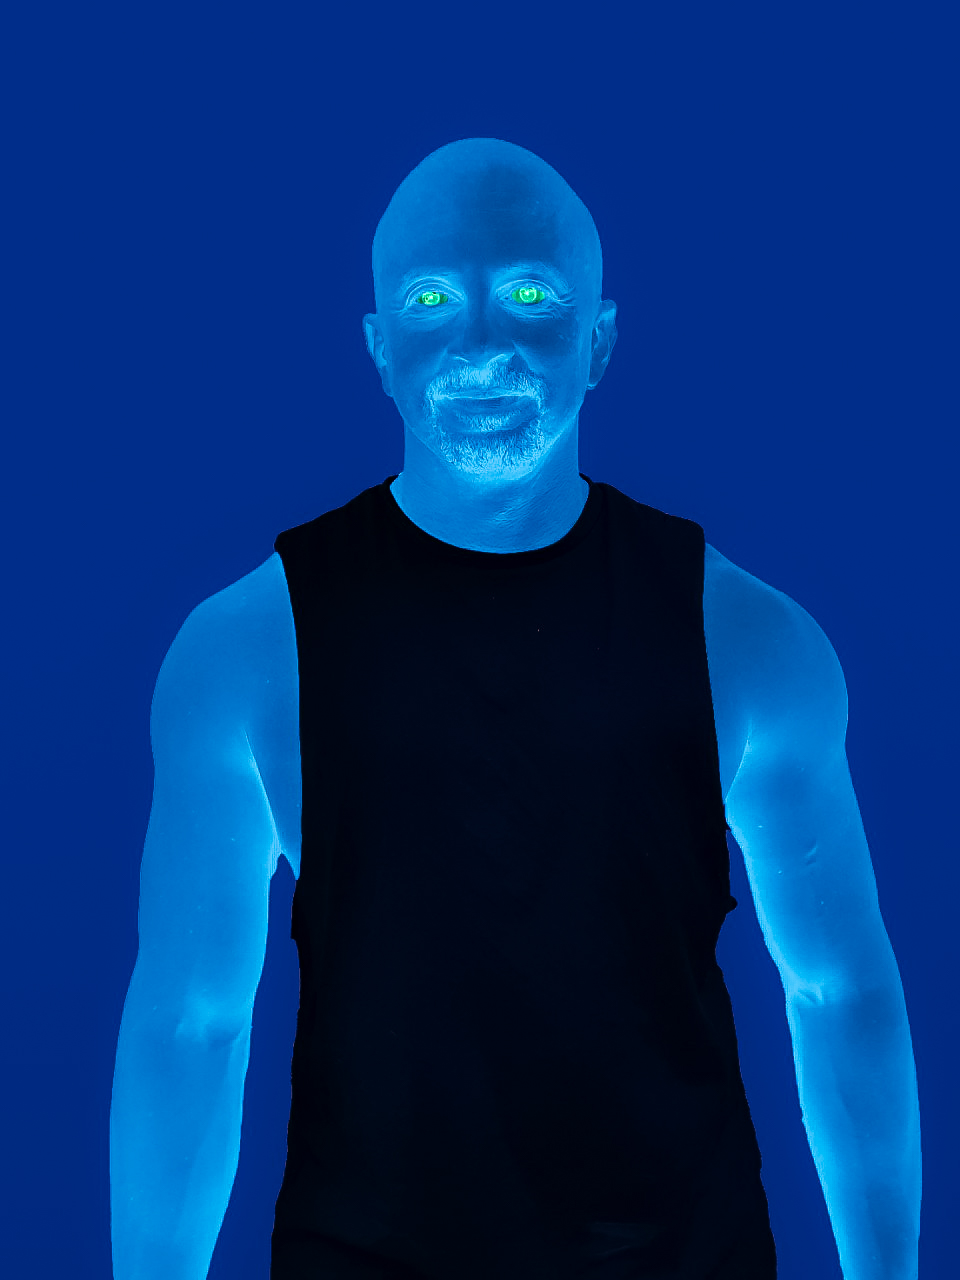 Glowing Body